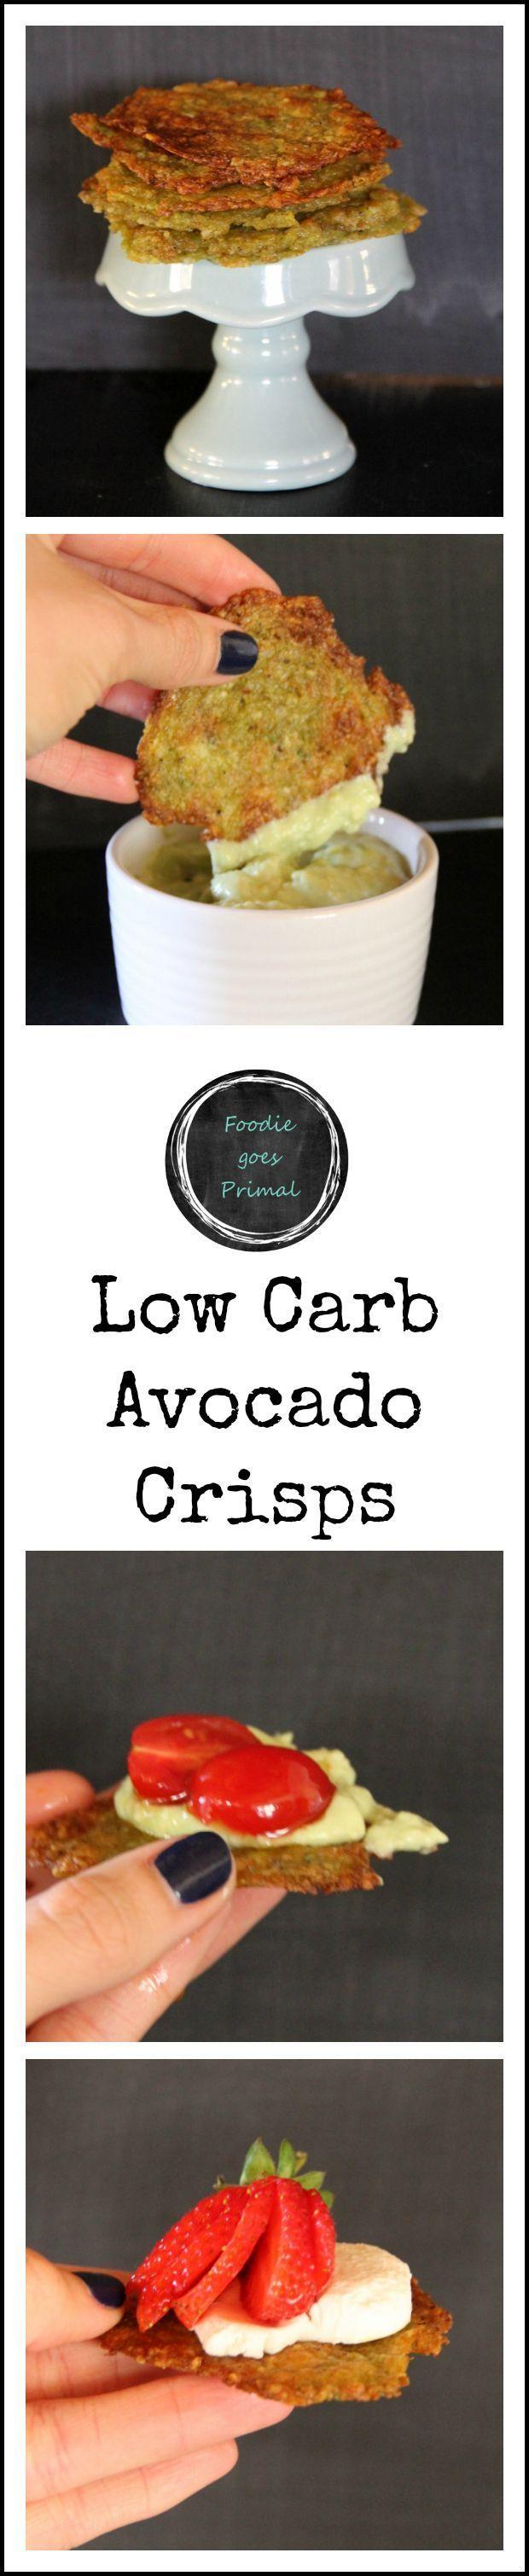 Low Carb Avocado Crisps - ripe Hass avocados, salt, finely grated hard cheese (e.g. Grana Pedana/Parmesan), lemon zest, black pepper